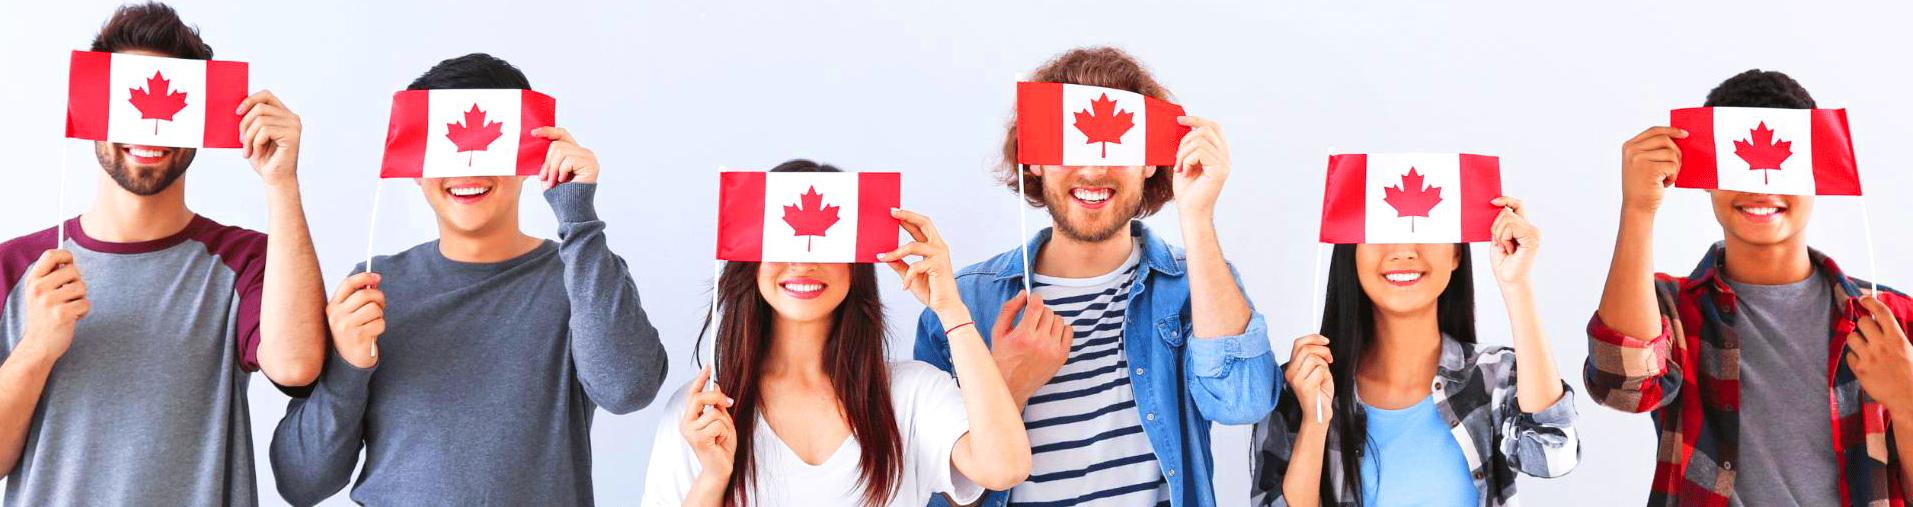 study Kanada, Canada na uniwersytetach i collegach